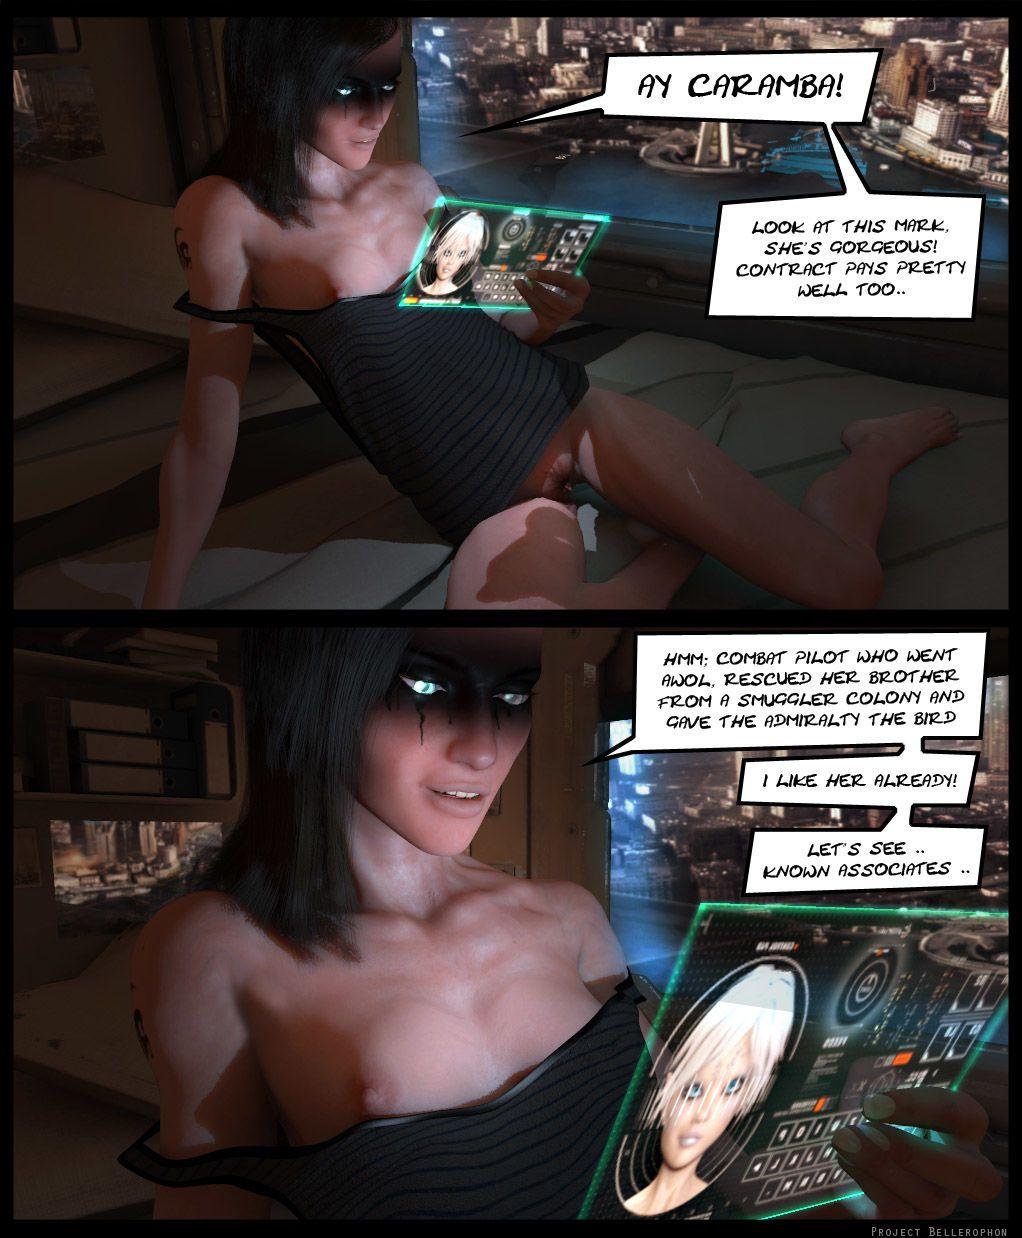 Project Bellerophon Comic 14: Firmware - part 2